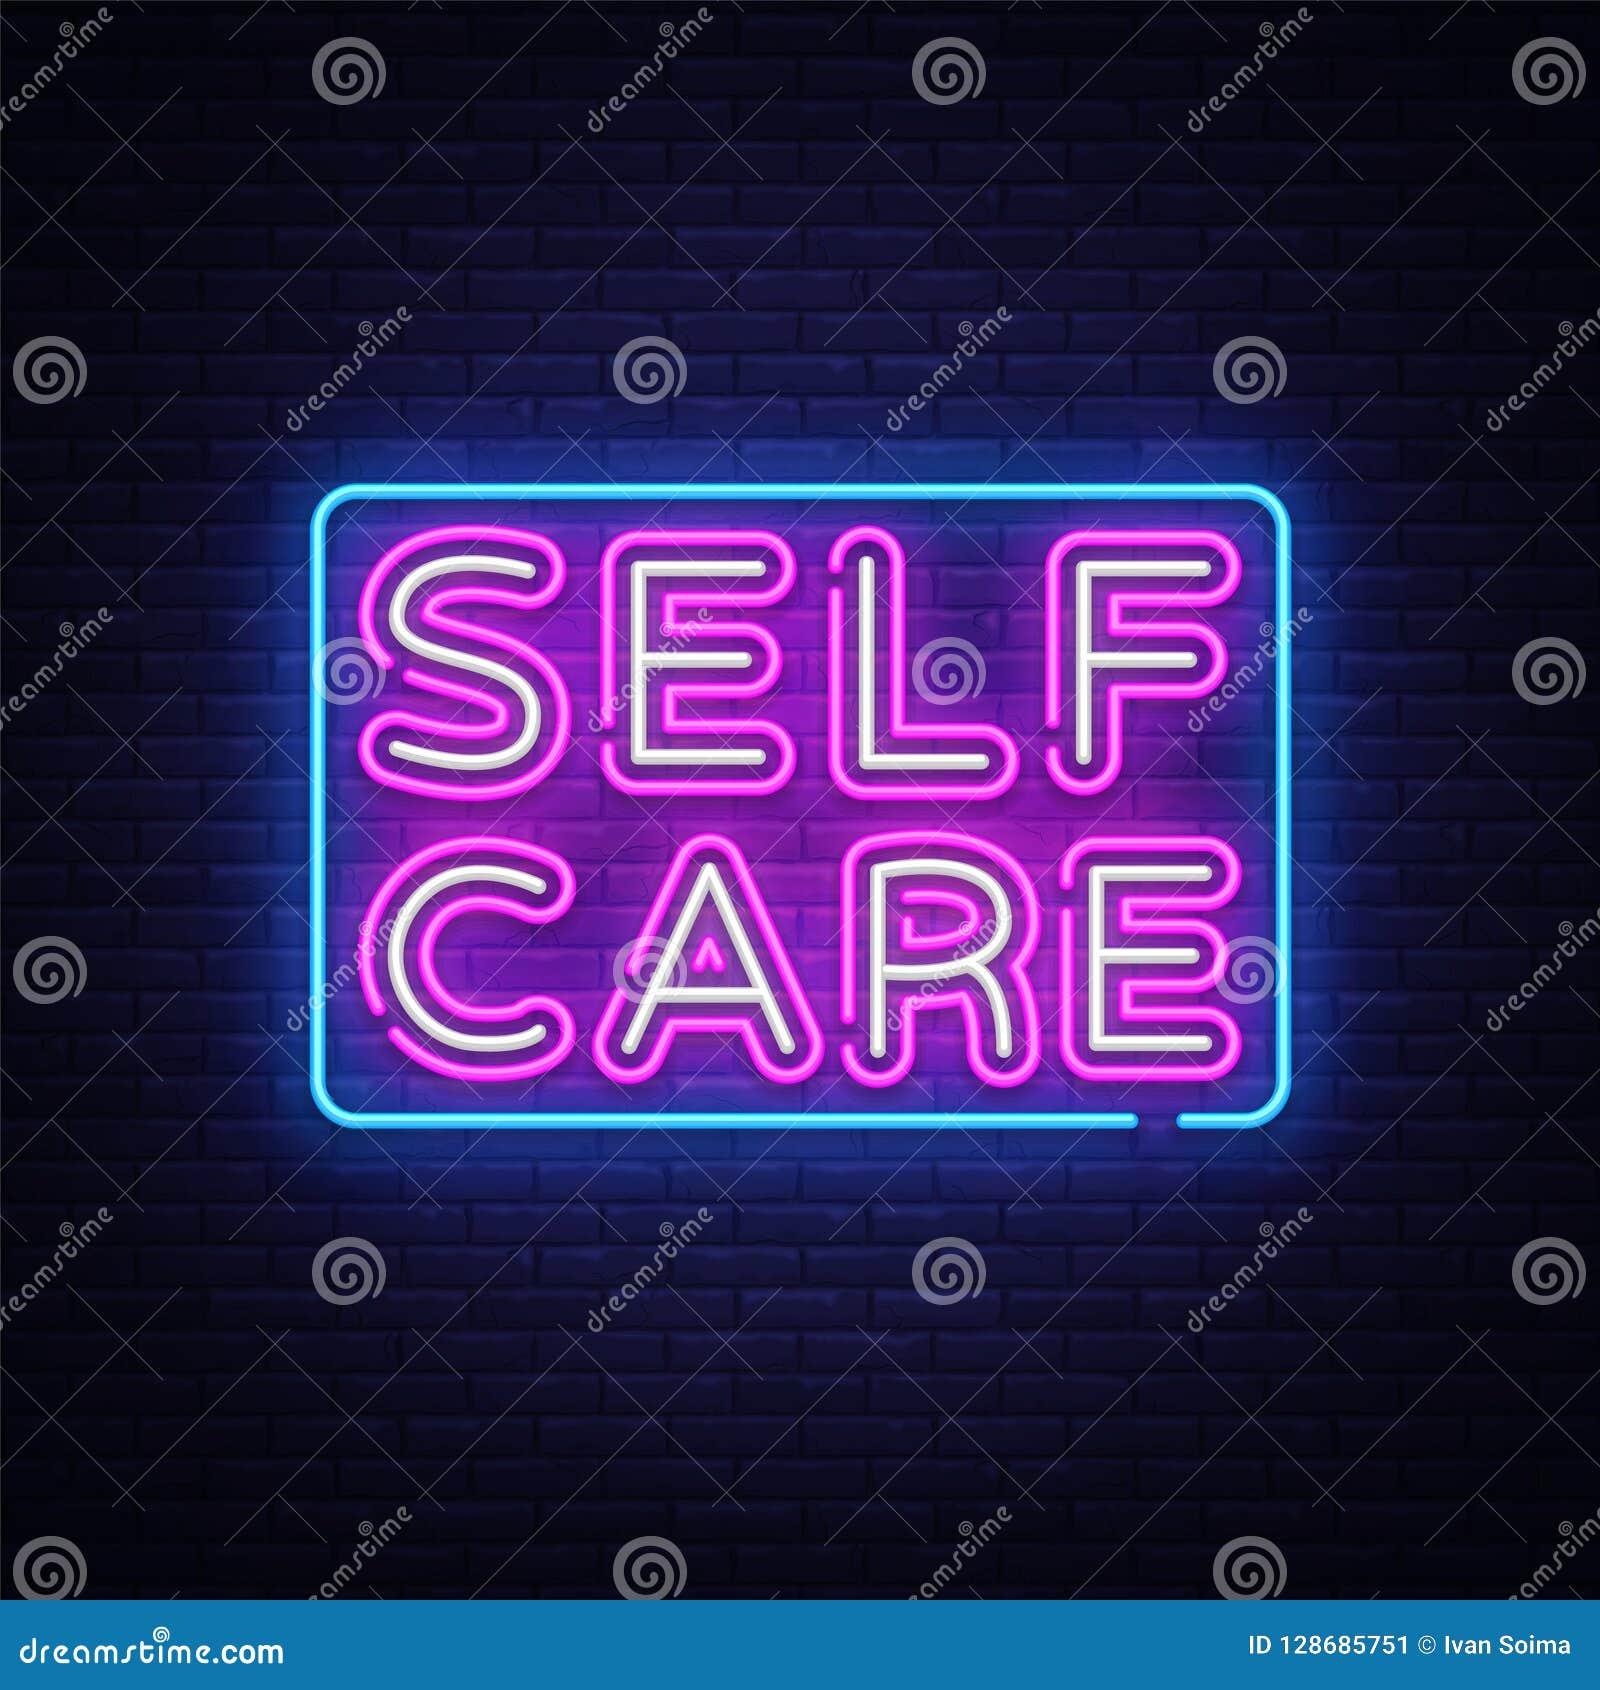 self care neon sign vector motivational feel good design template